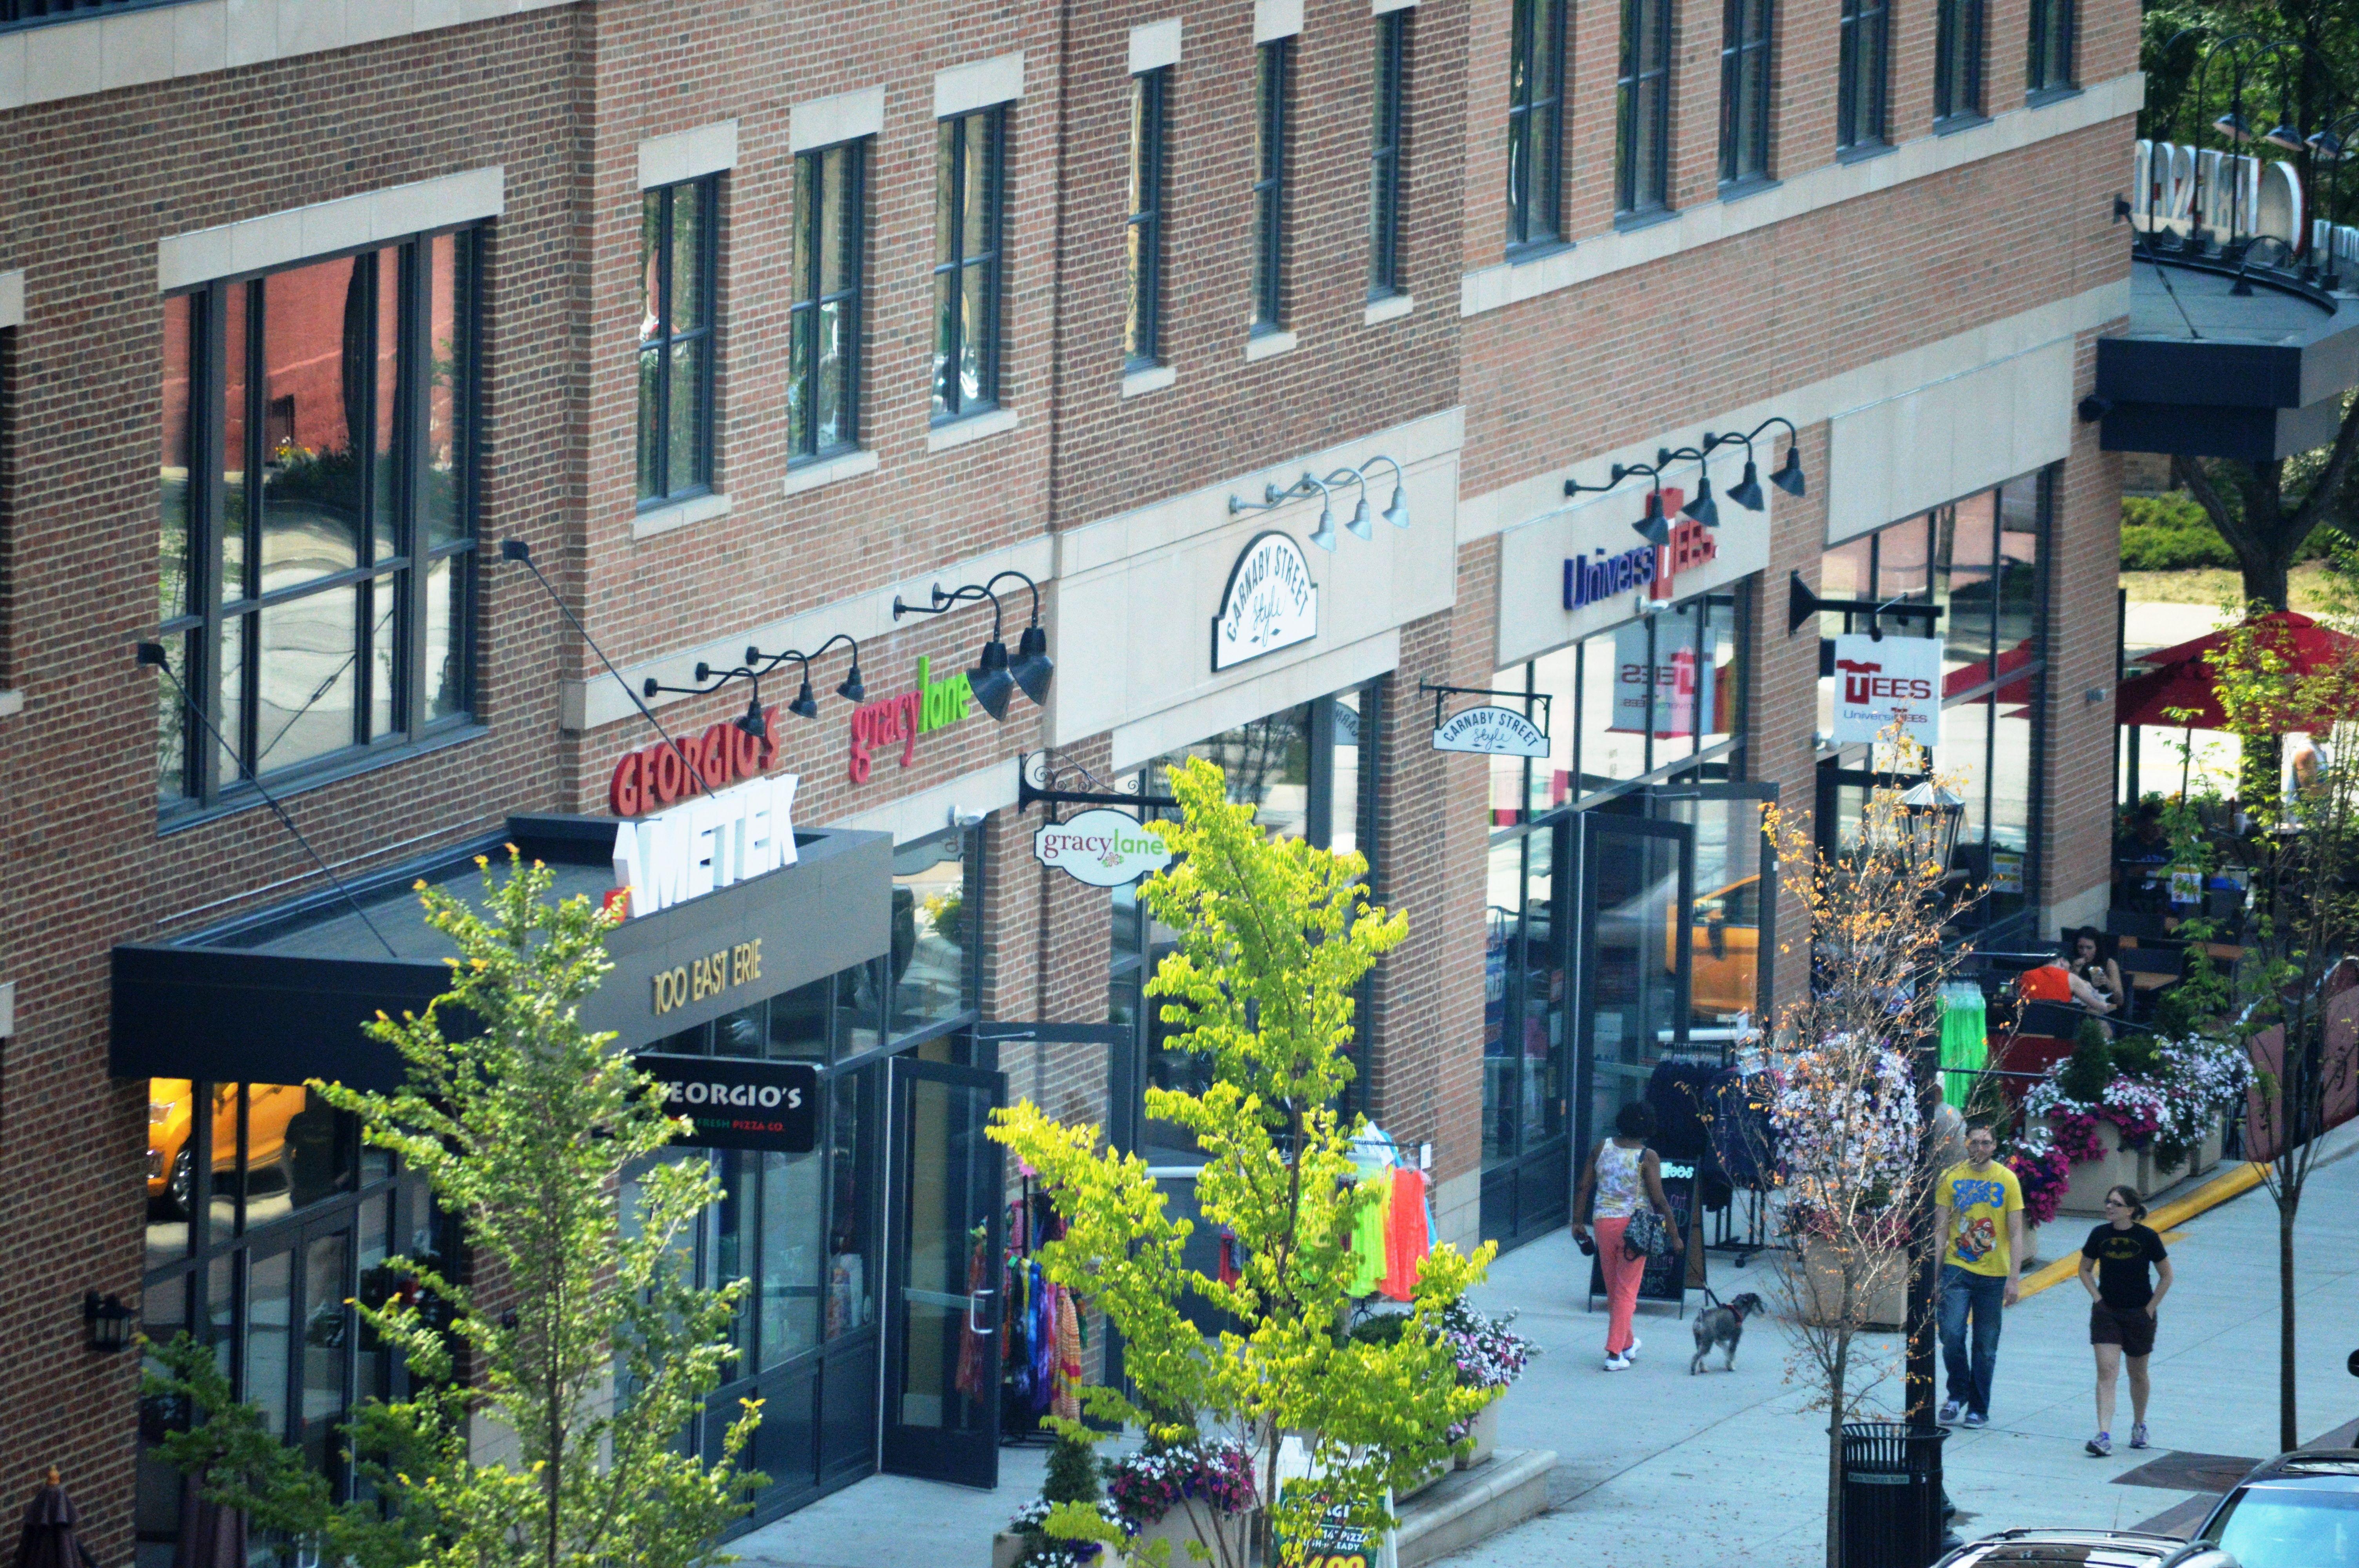 Downtown kent august 2013 kent ohio favorite places